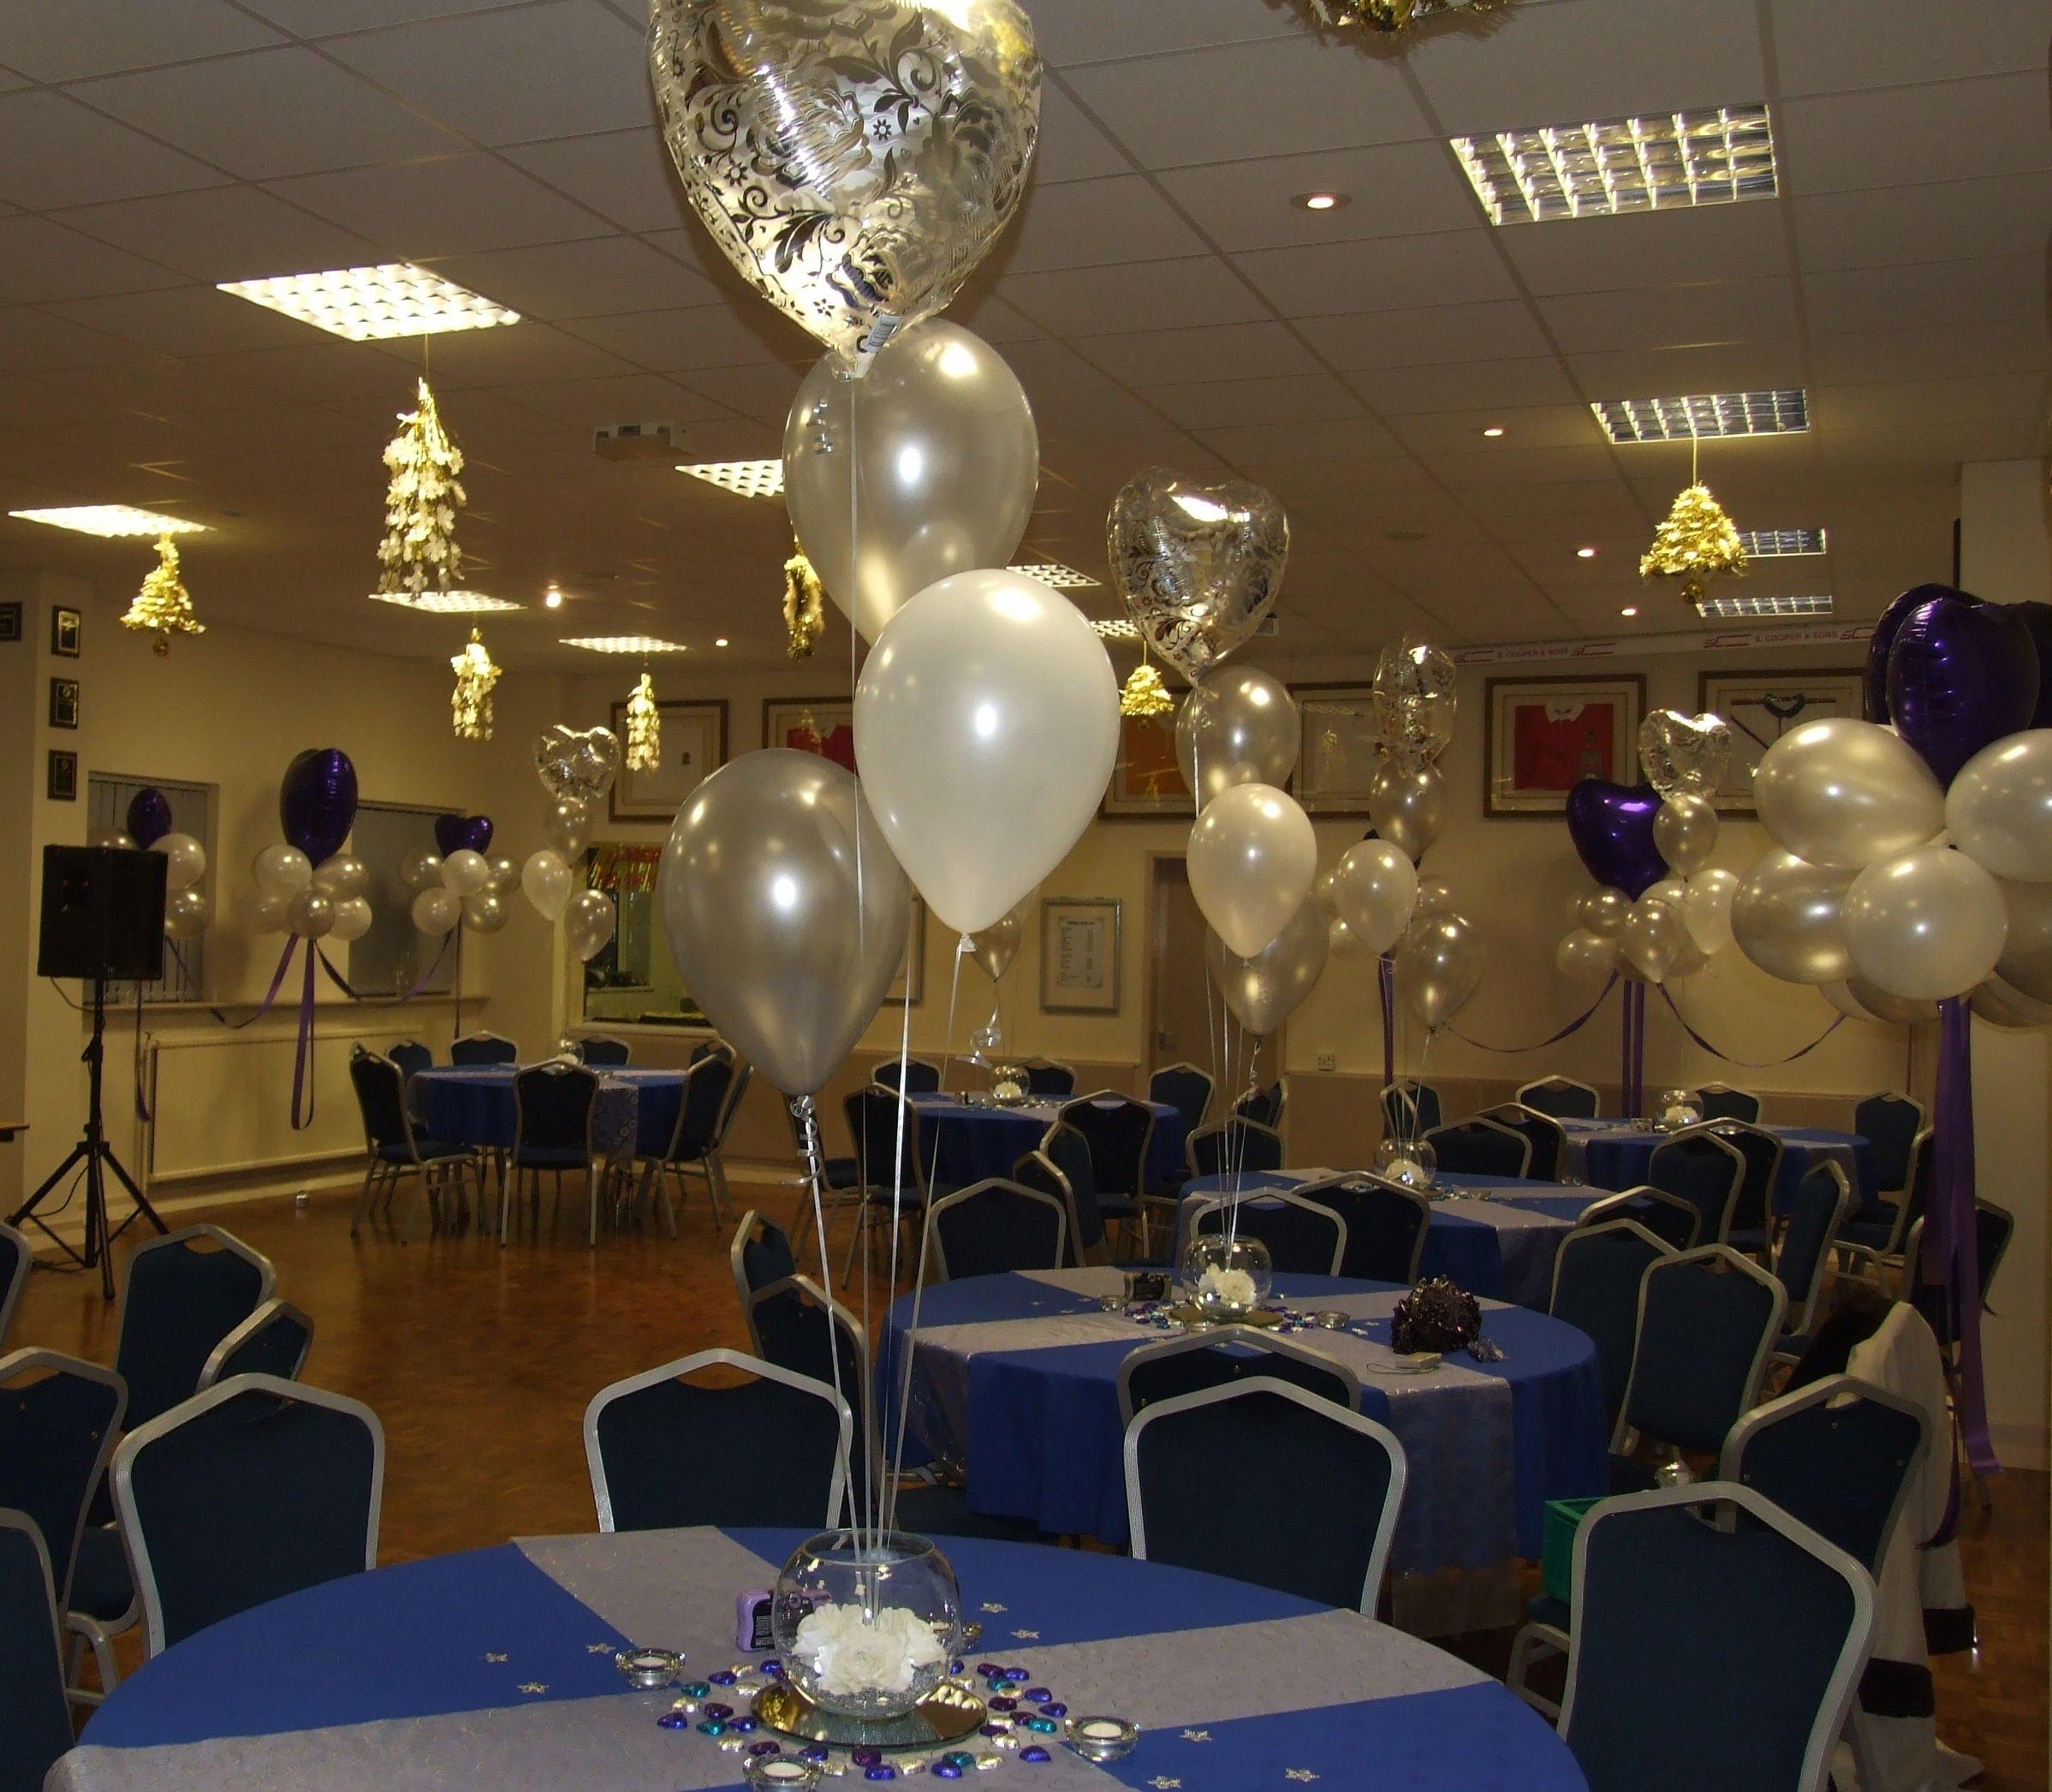 10 Wonderful 25 Wedding Anniversary Party Ideas download 25 wedding anniversary decorations wedding corners 2 2020